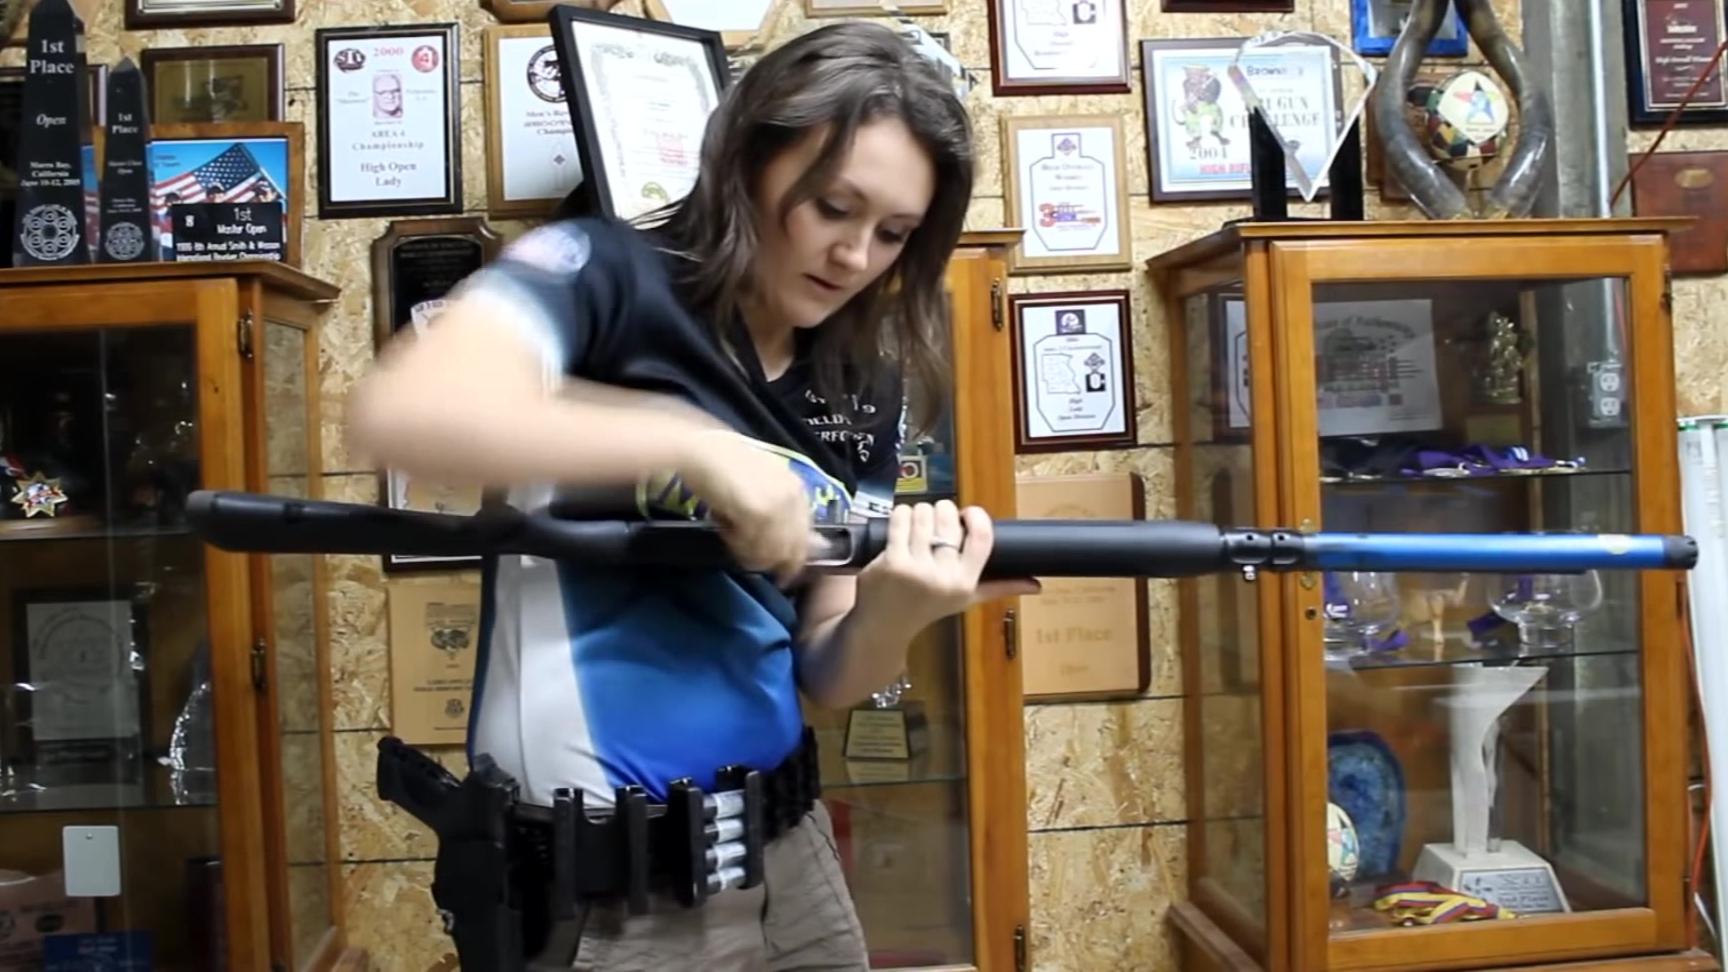 Lena Miculek姐教你如何霰弹强手战术换弹